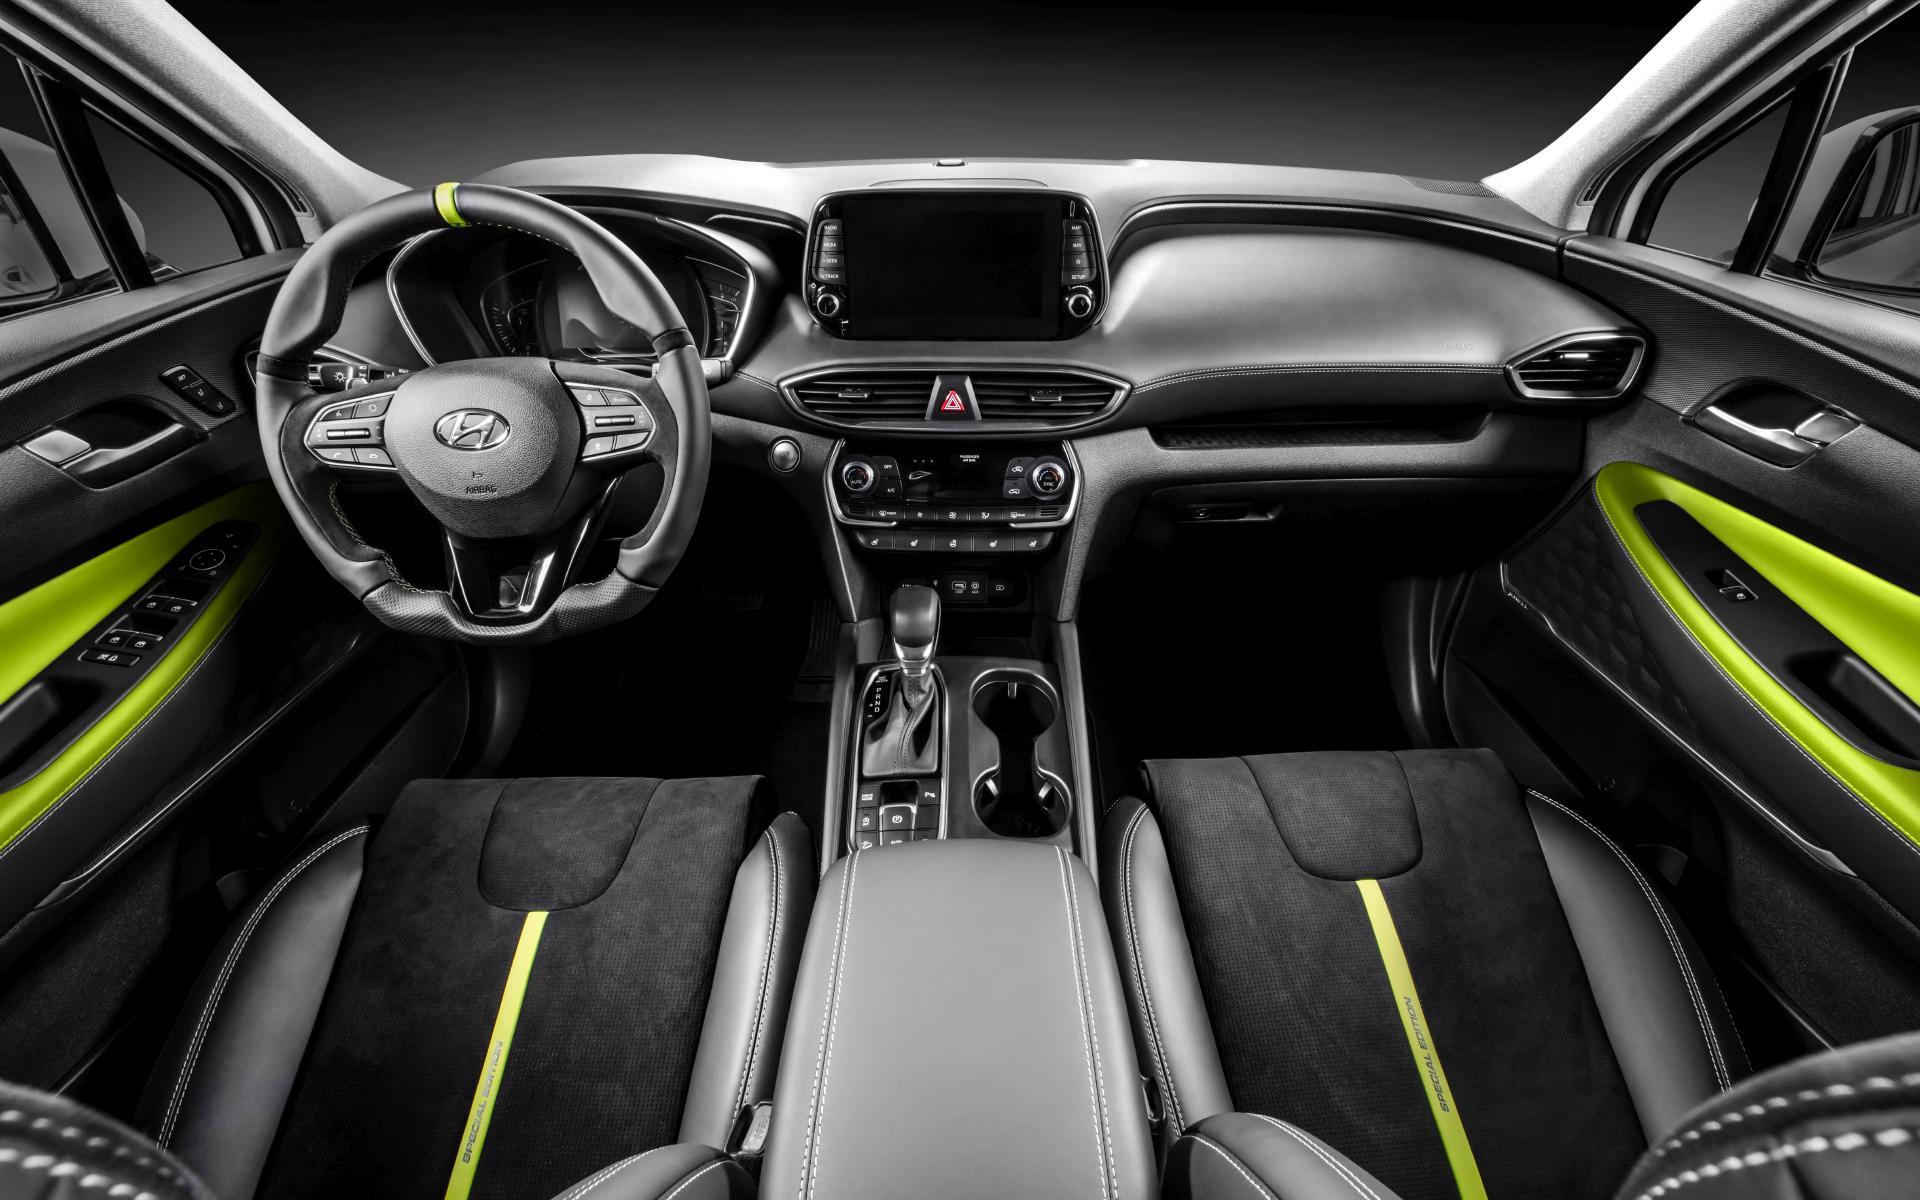 Hyundai-Santa-Fe-by-Carlex-Design-20